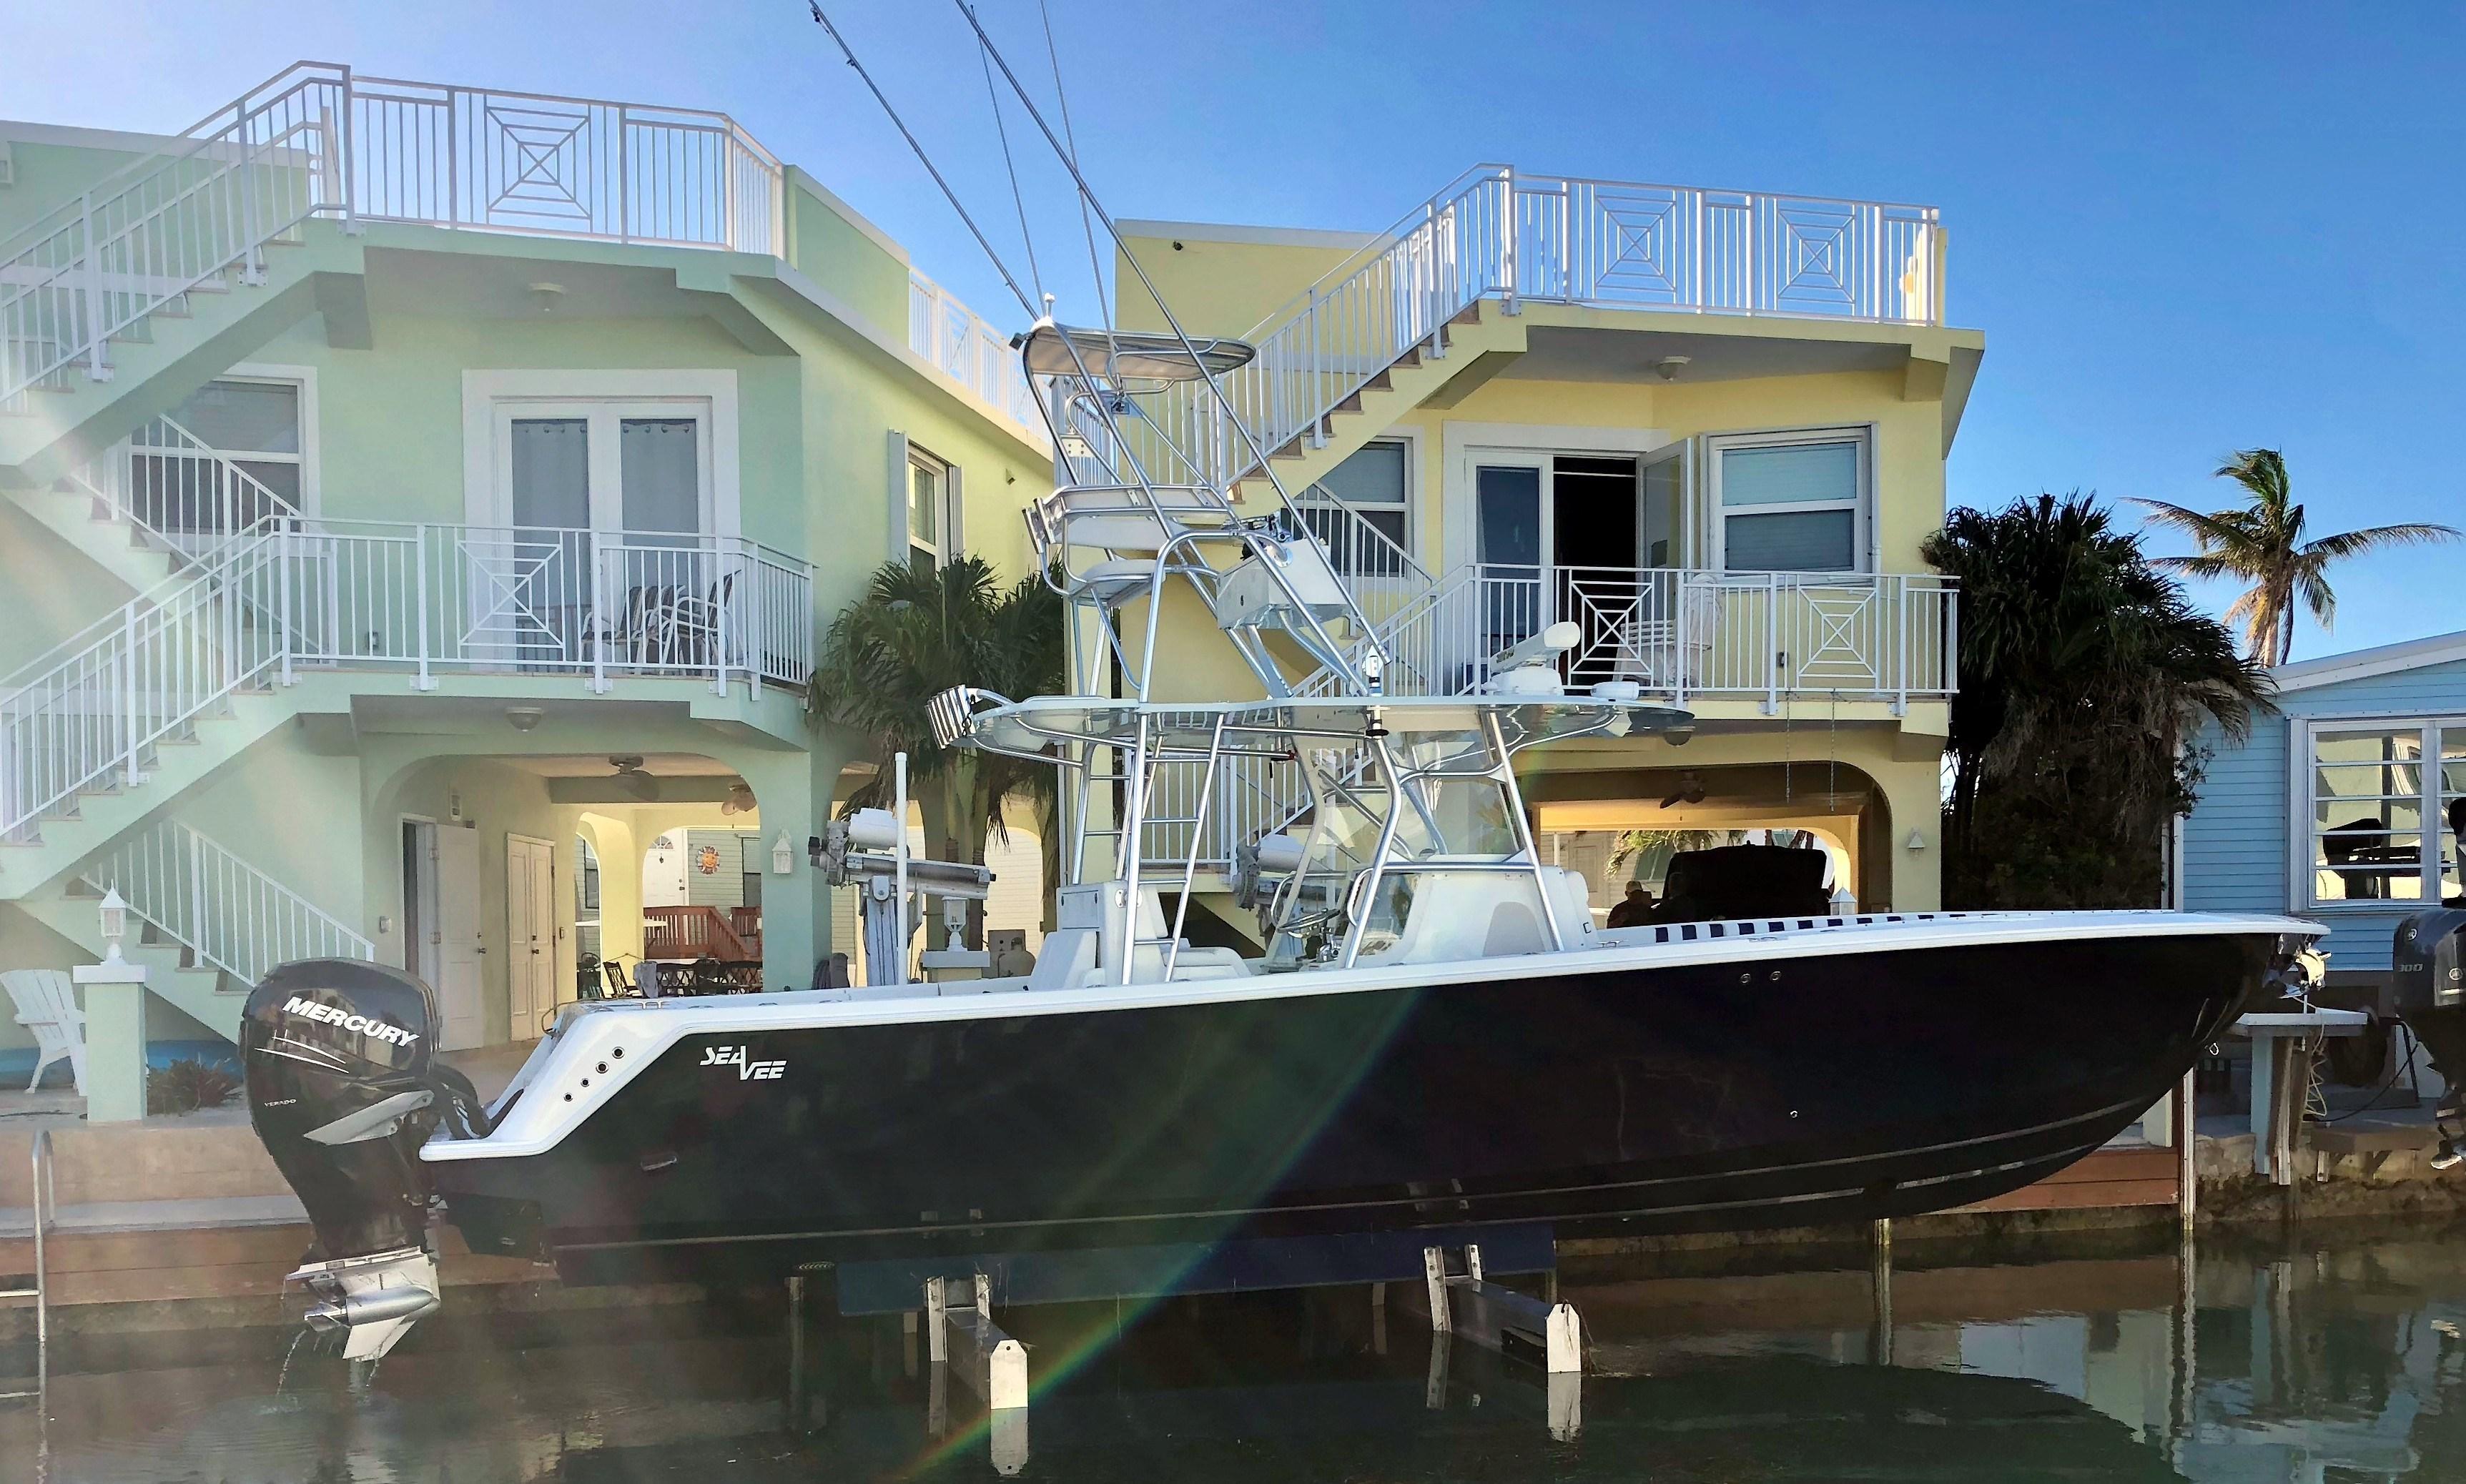 2013 SeaVee 390B